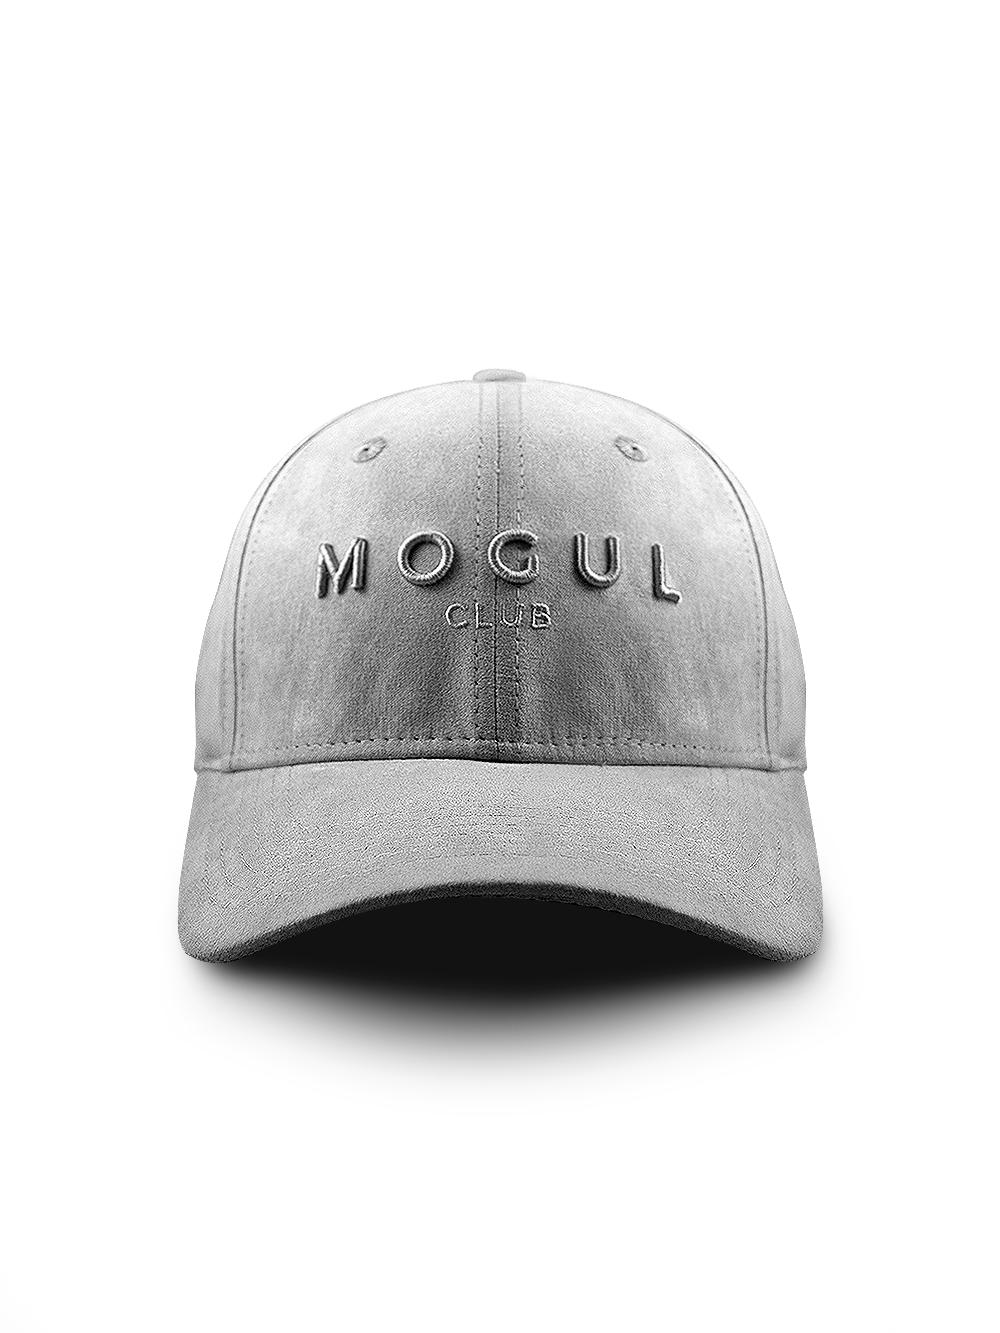 Luxe Suede Baseball Cap Grey - Mogul Club a92645d3213